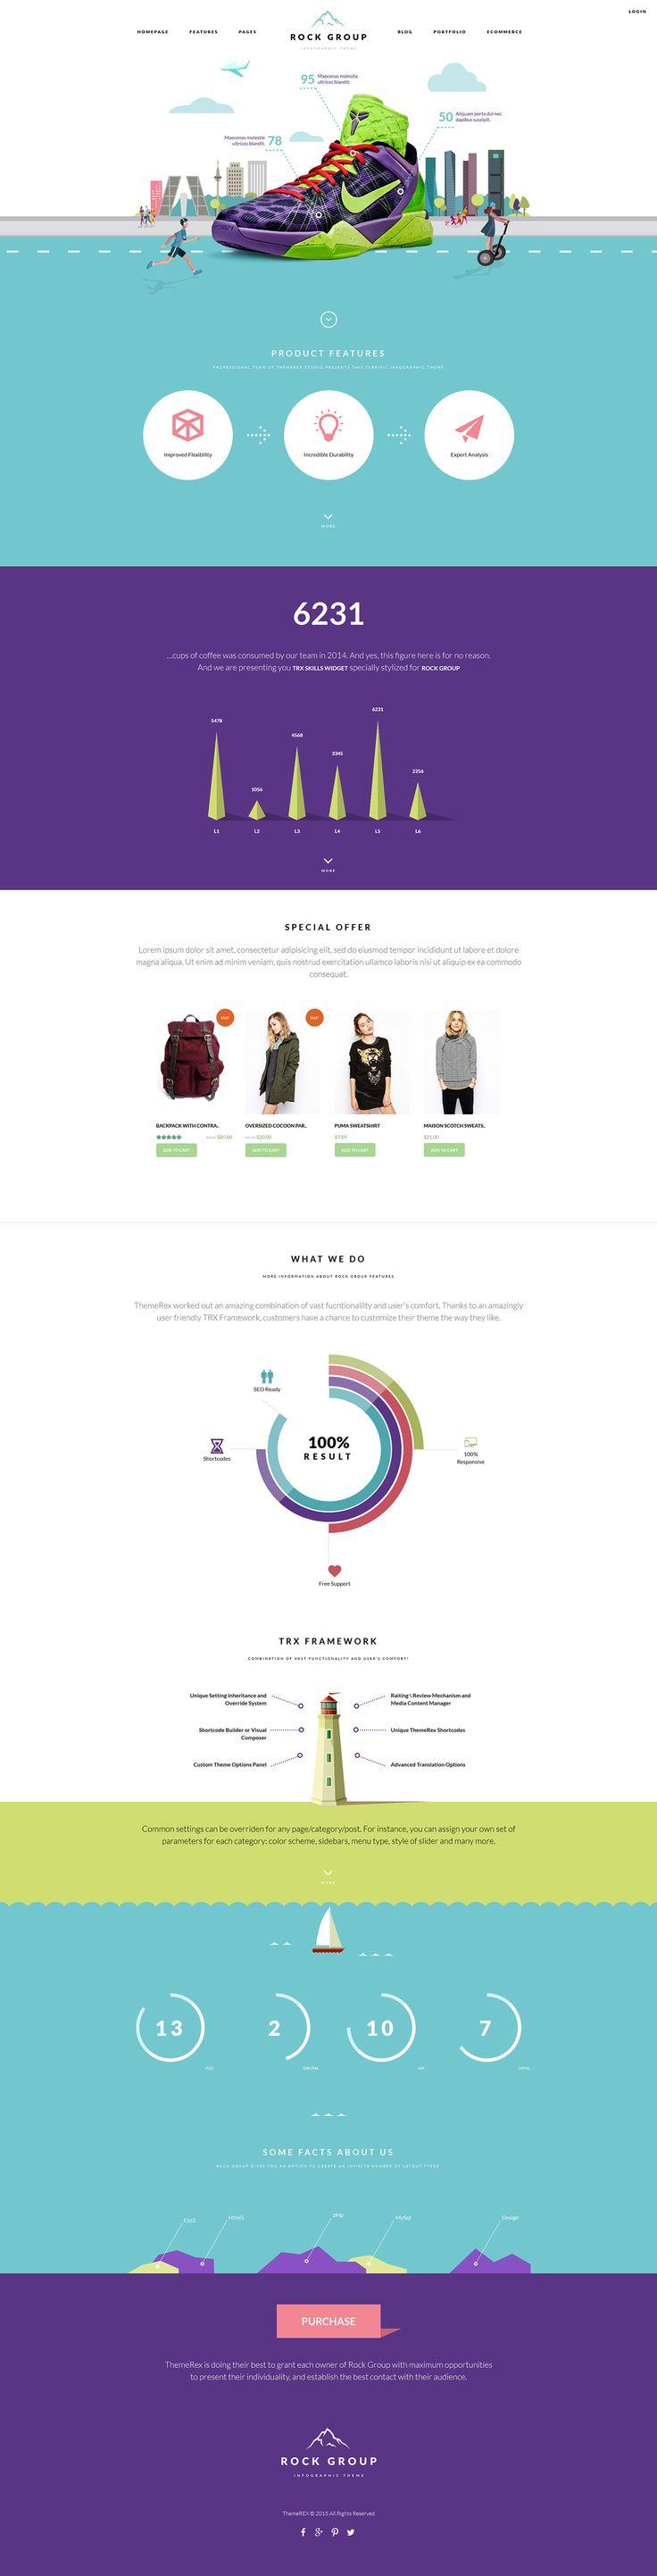 Rock Group | Multipurpose Infographic Theme on Behance